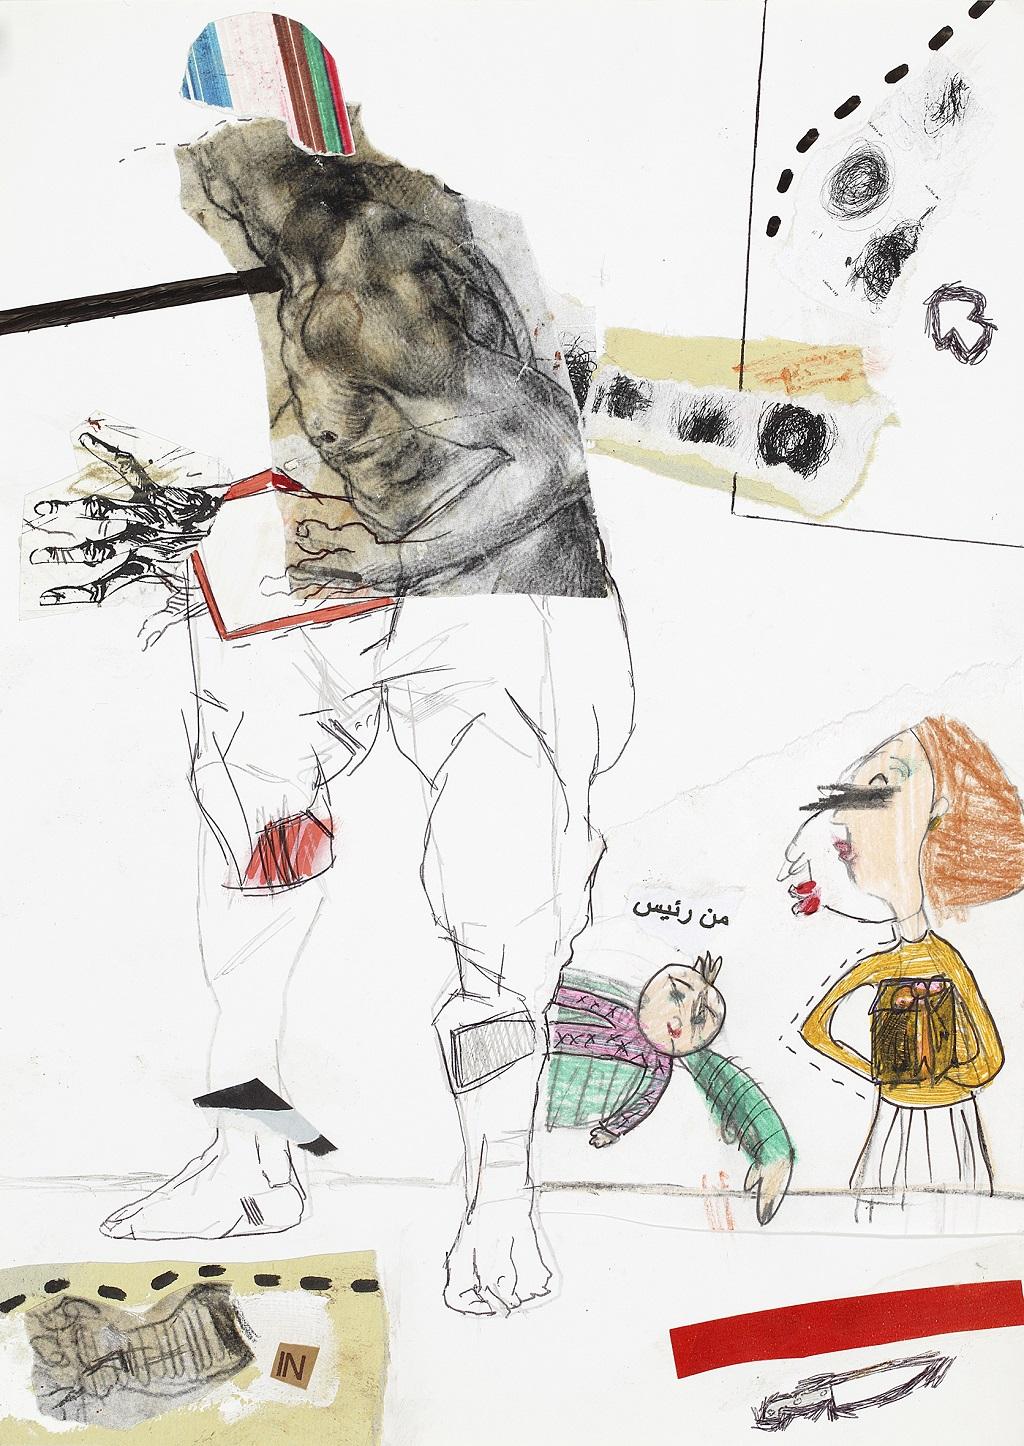 Thameur Mejri, Untitled, 2014, ELMARSA Gallery │© Thameur Mejri, ELMARSA Gallery, Courtesy of Art Paris Art Fair